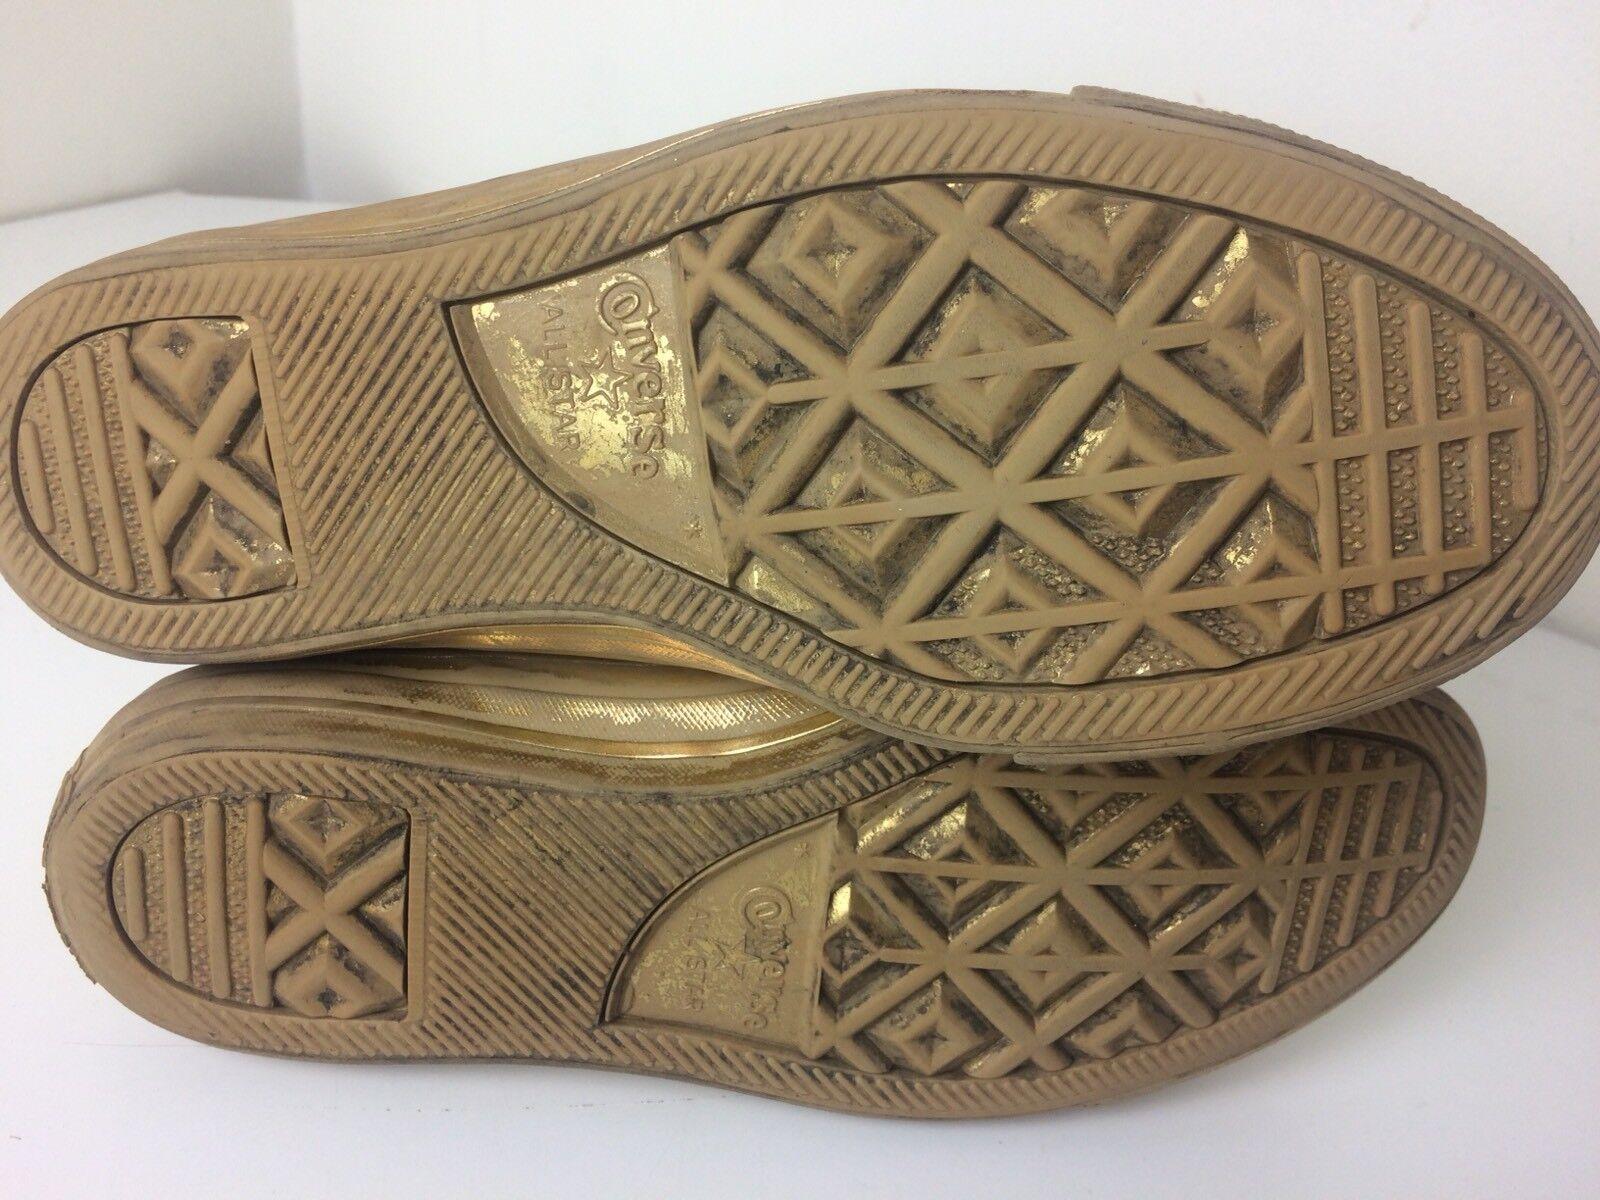 Converse All Star Star Star Chuck Taylor Metallic Doré Hi Top Sneakers US 7.5 Vietnam 17e06b